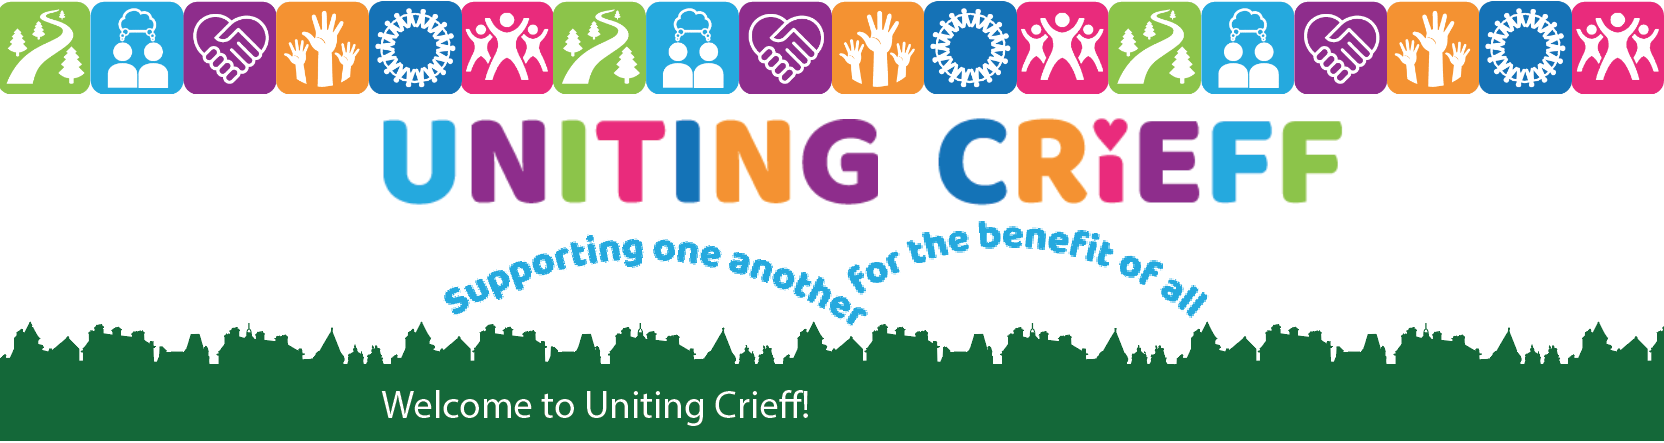 Uniting Crieff